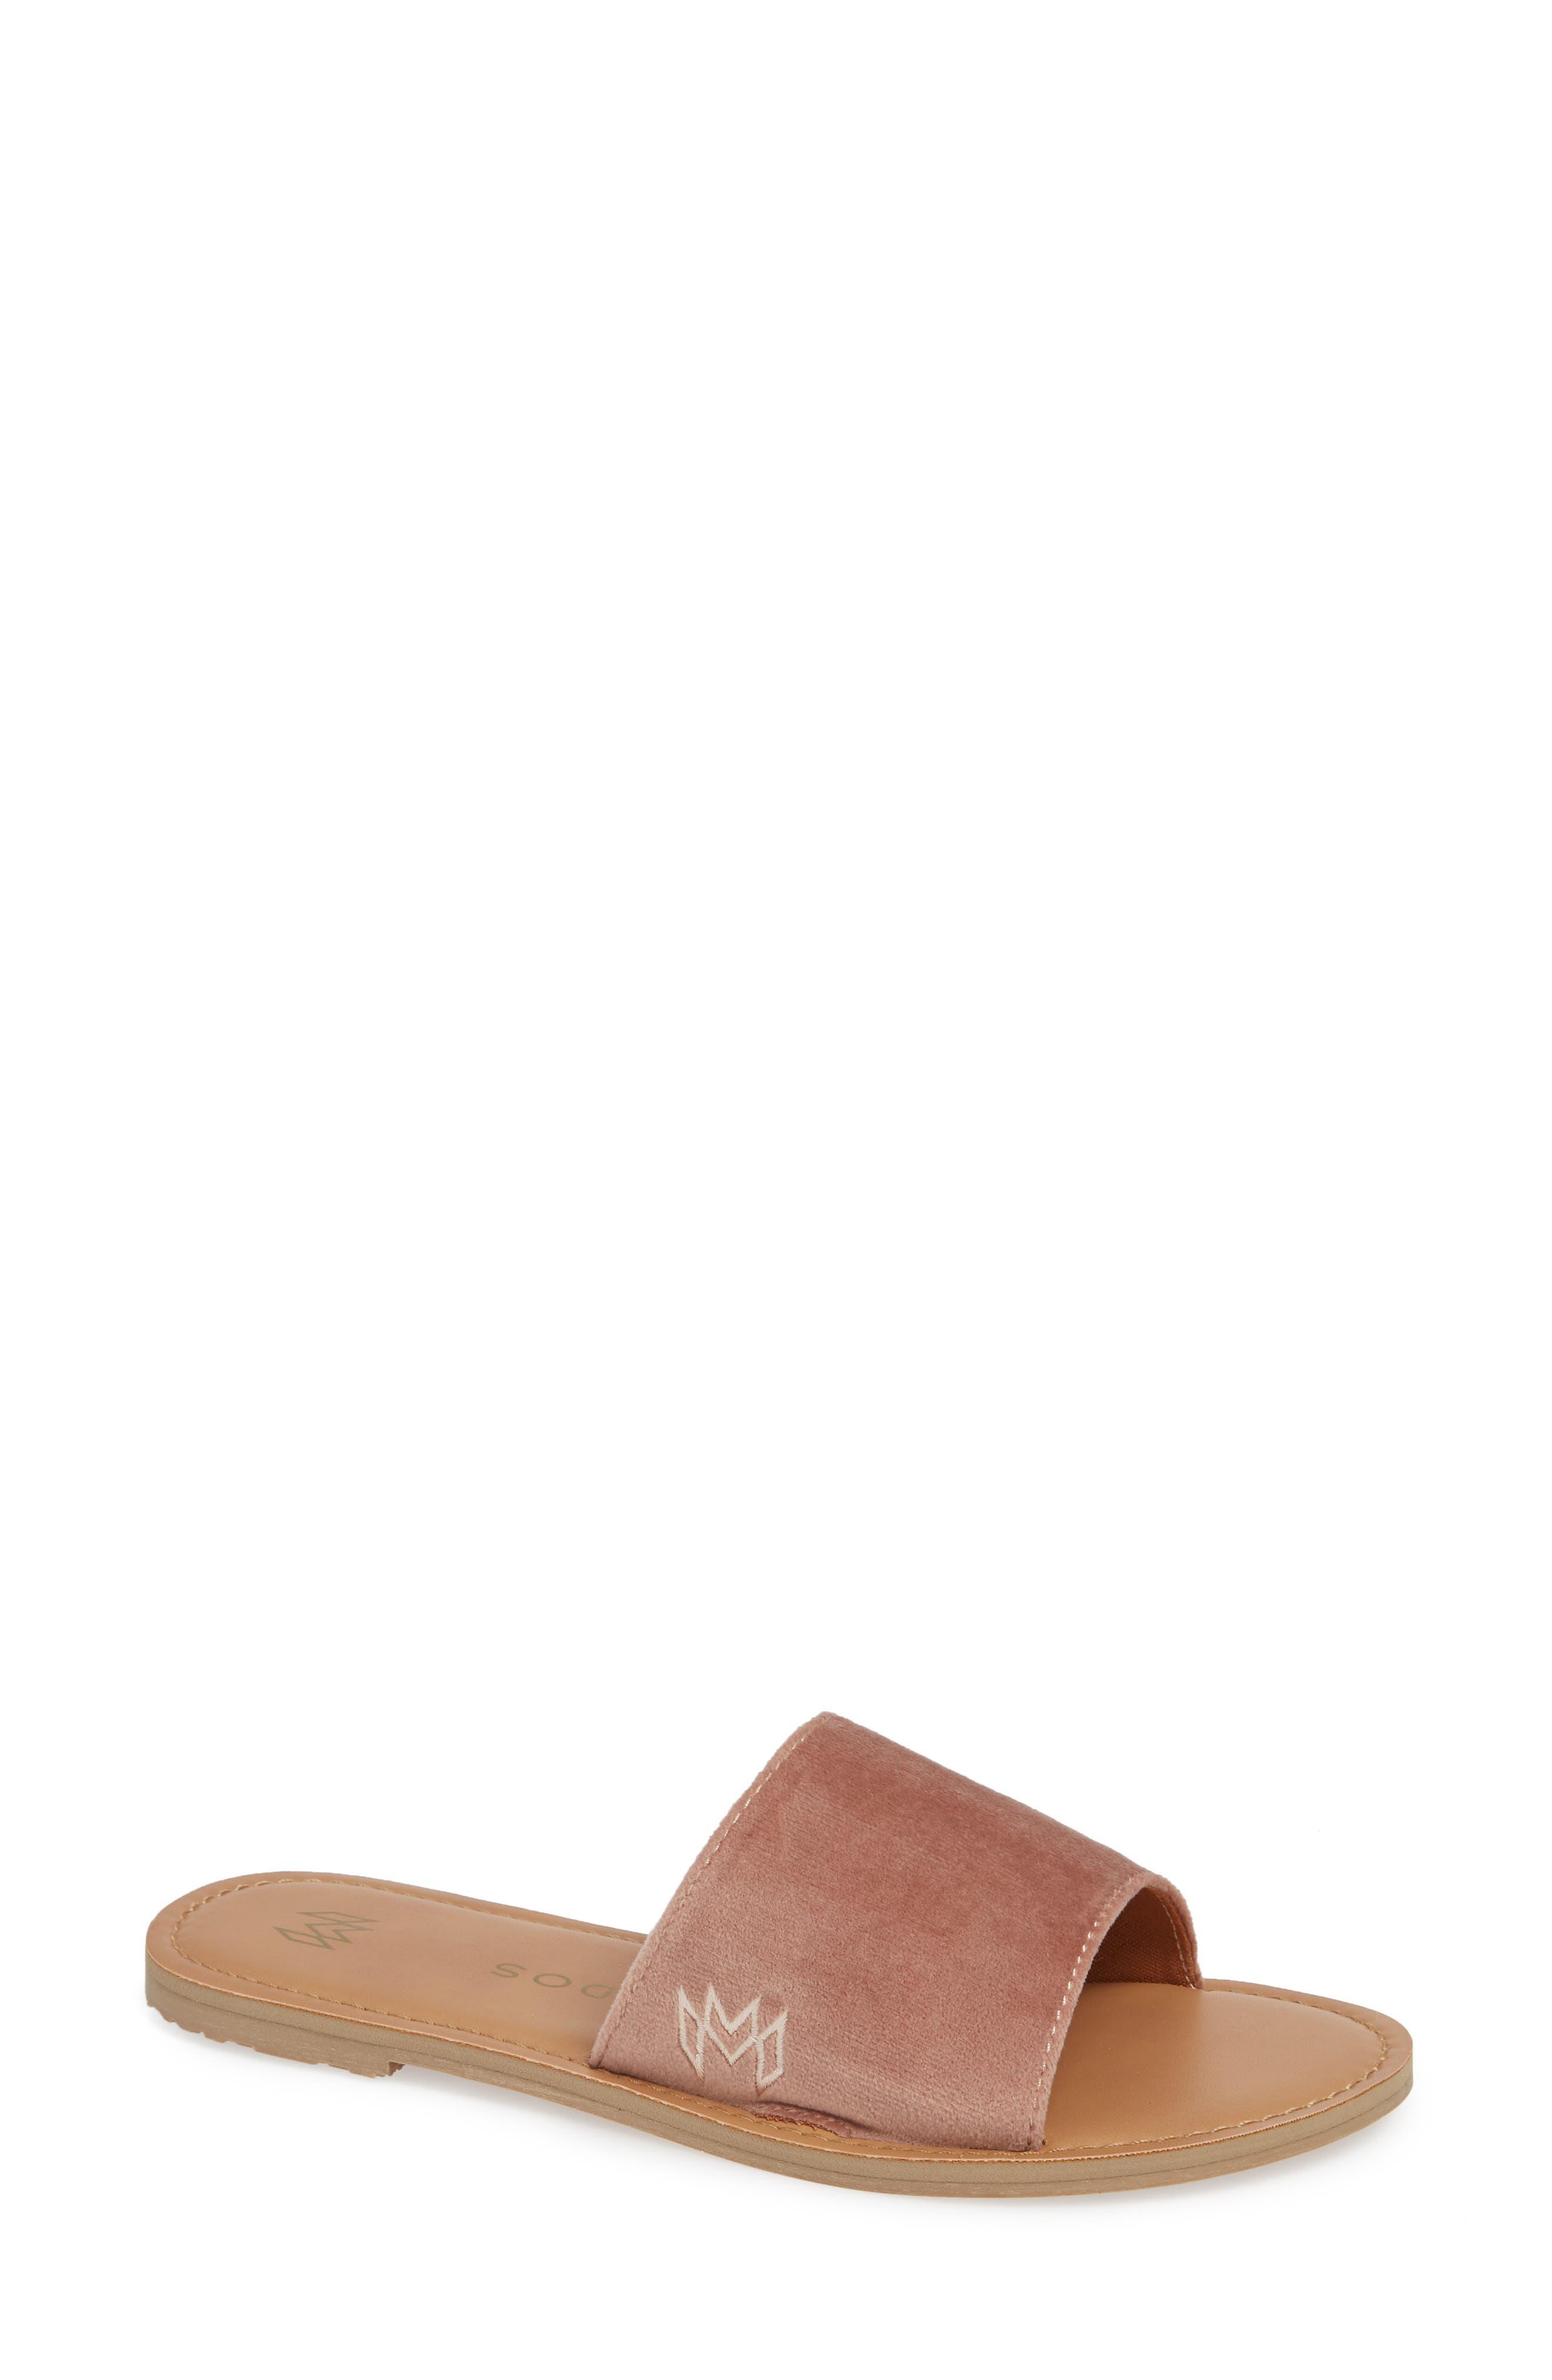 MALVADOS Icon Taylor Plush Slide Sandal, Main, color, COGNAC